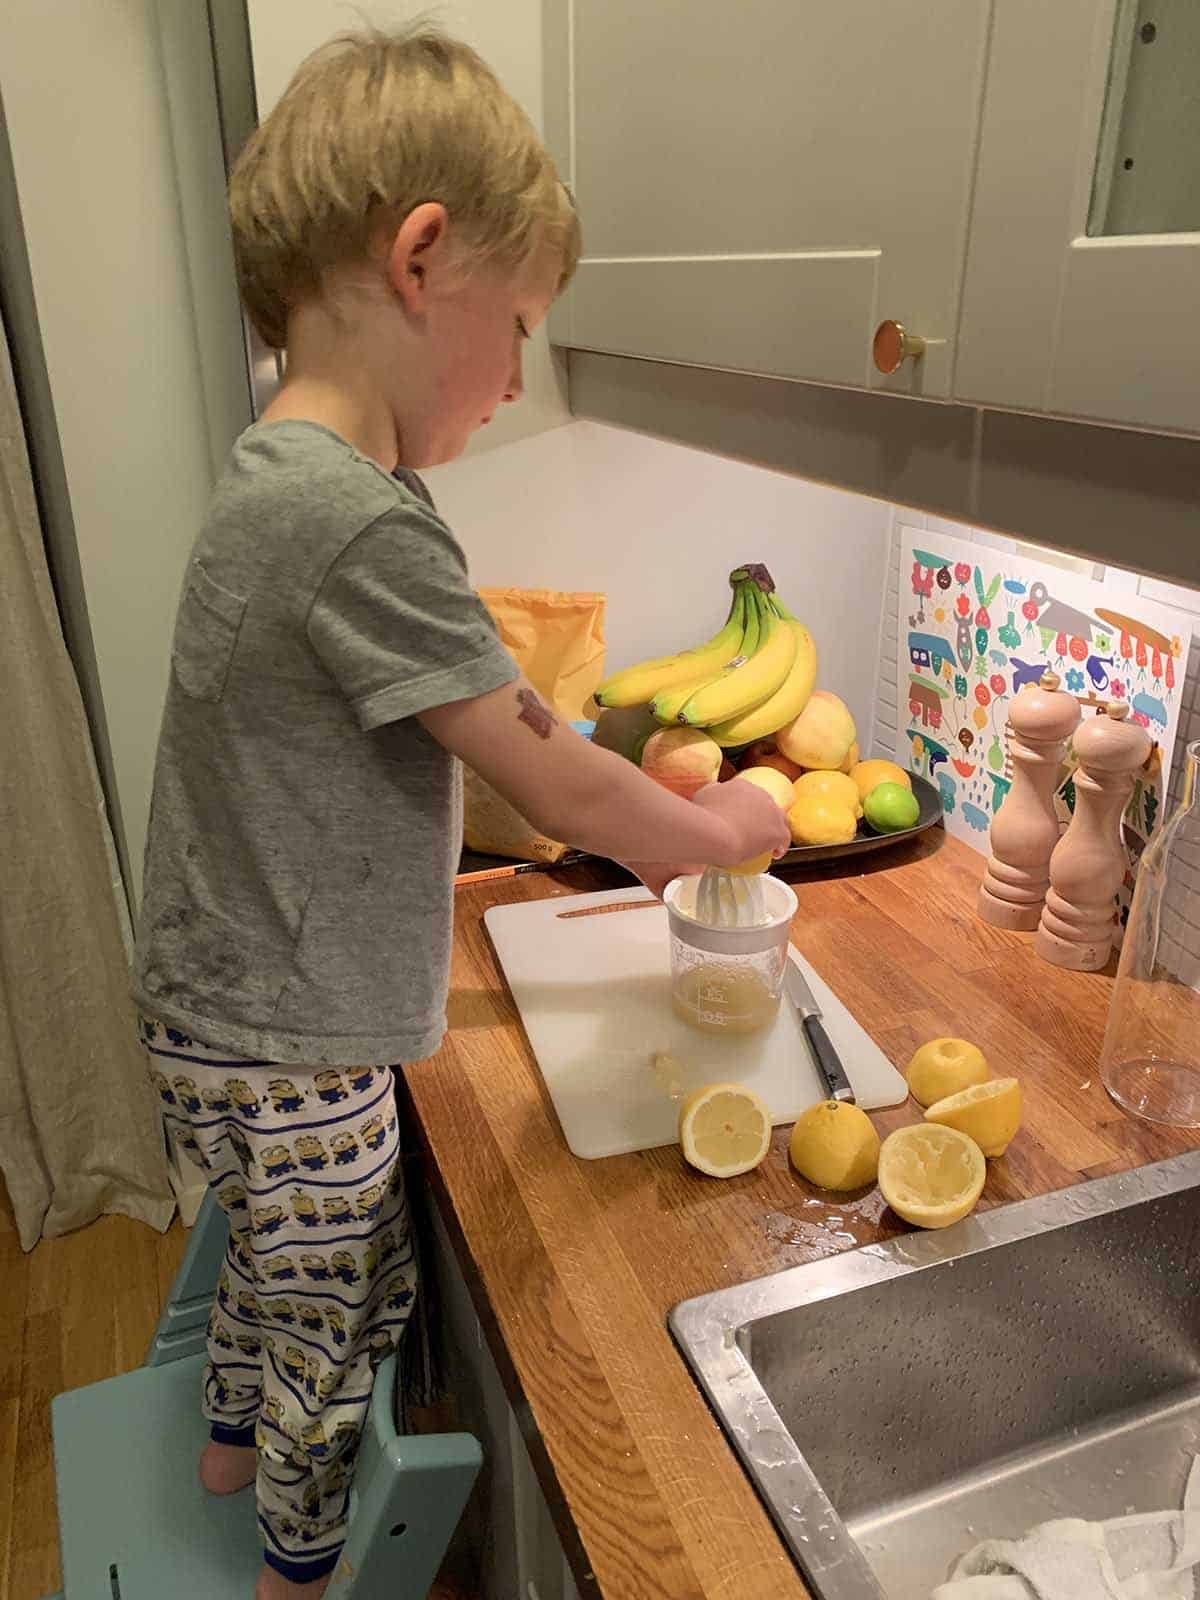 a blond boy juicing lemons